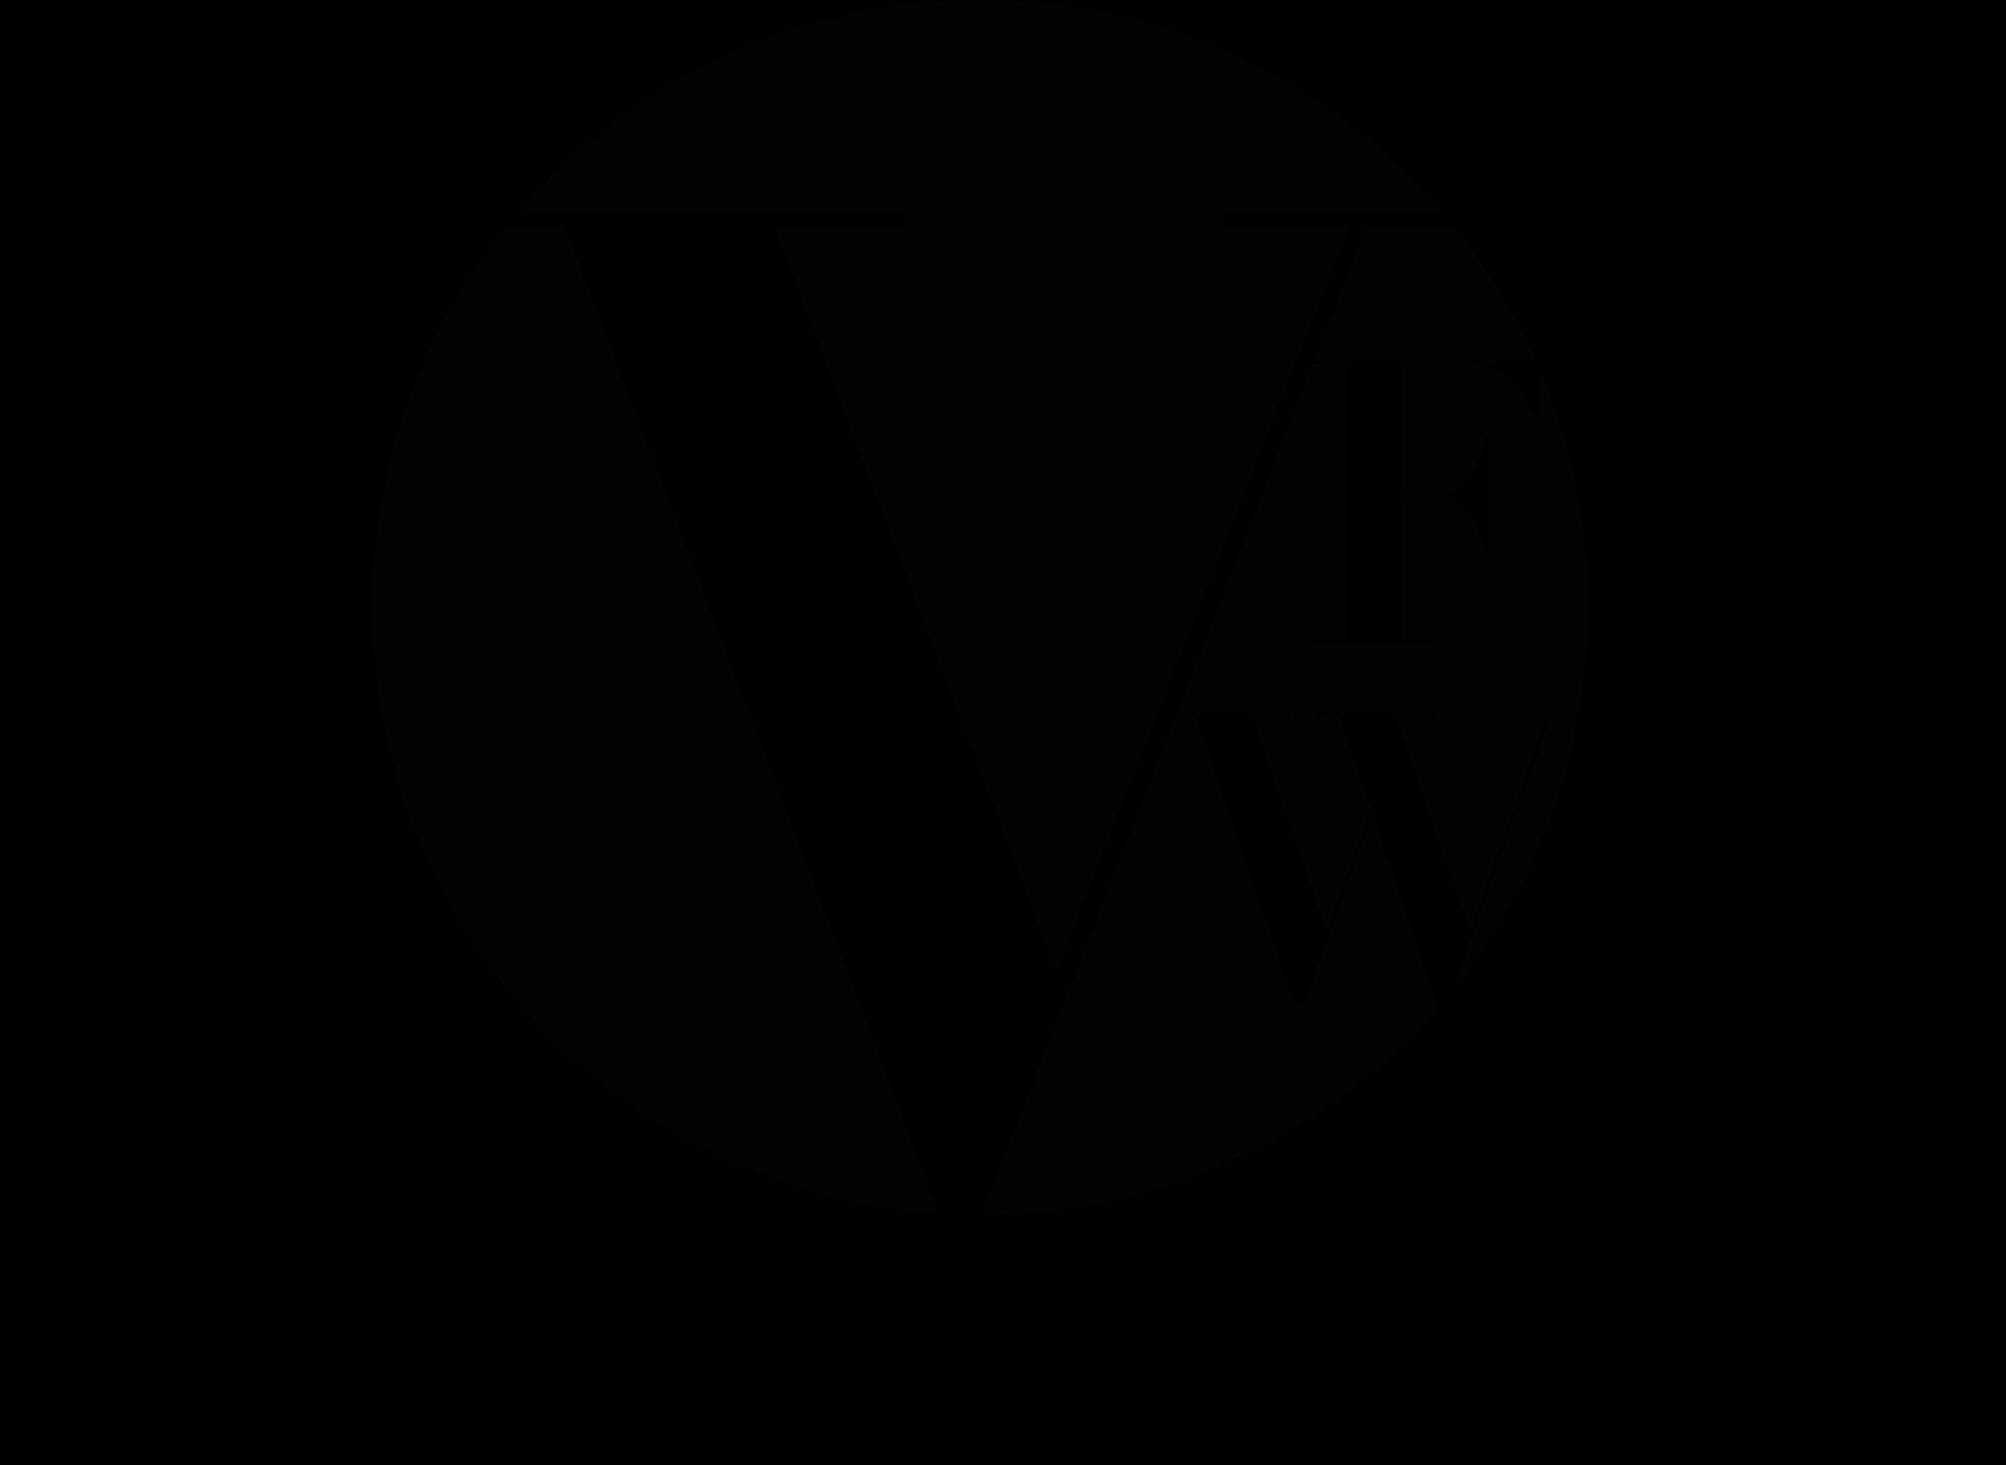 VFW-logo_HD.png